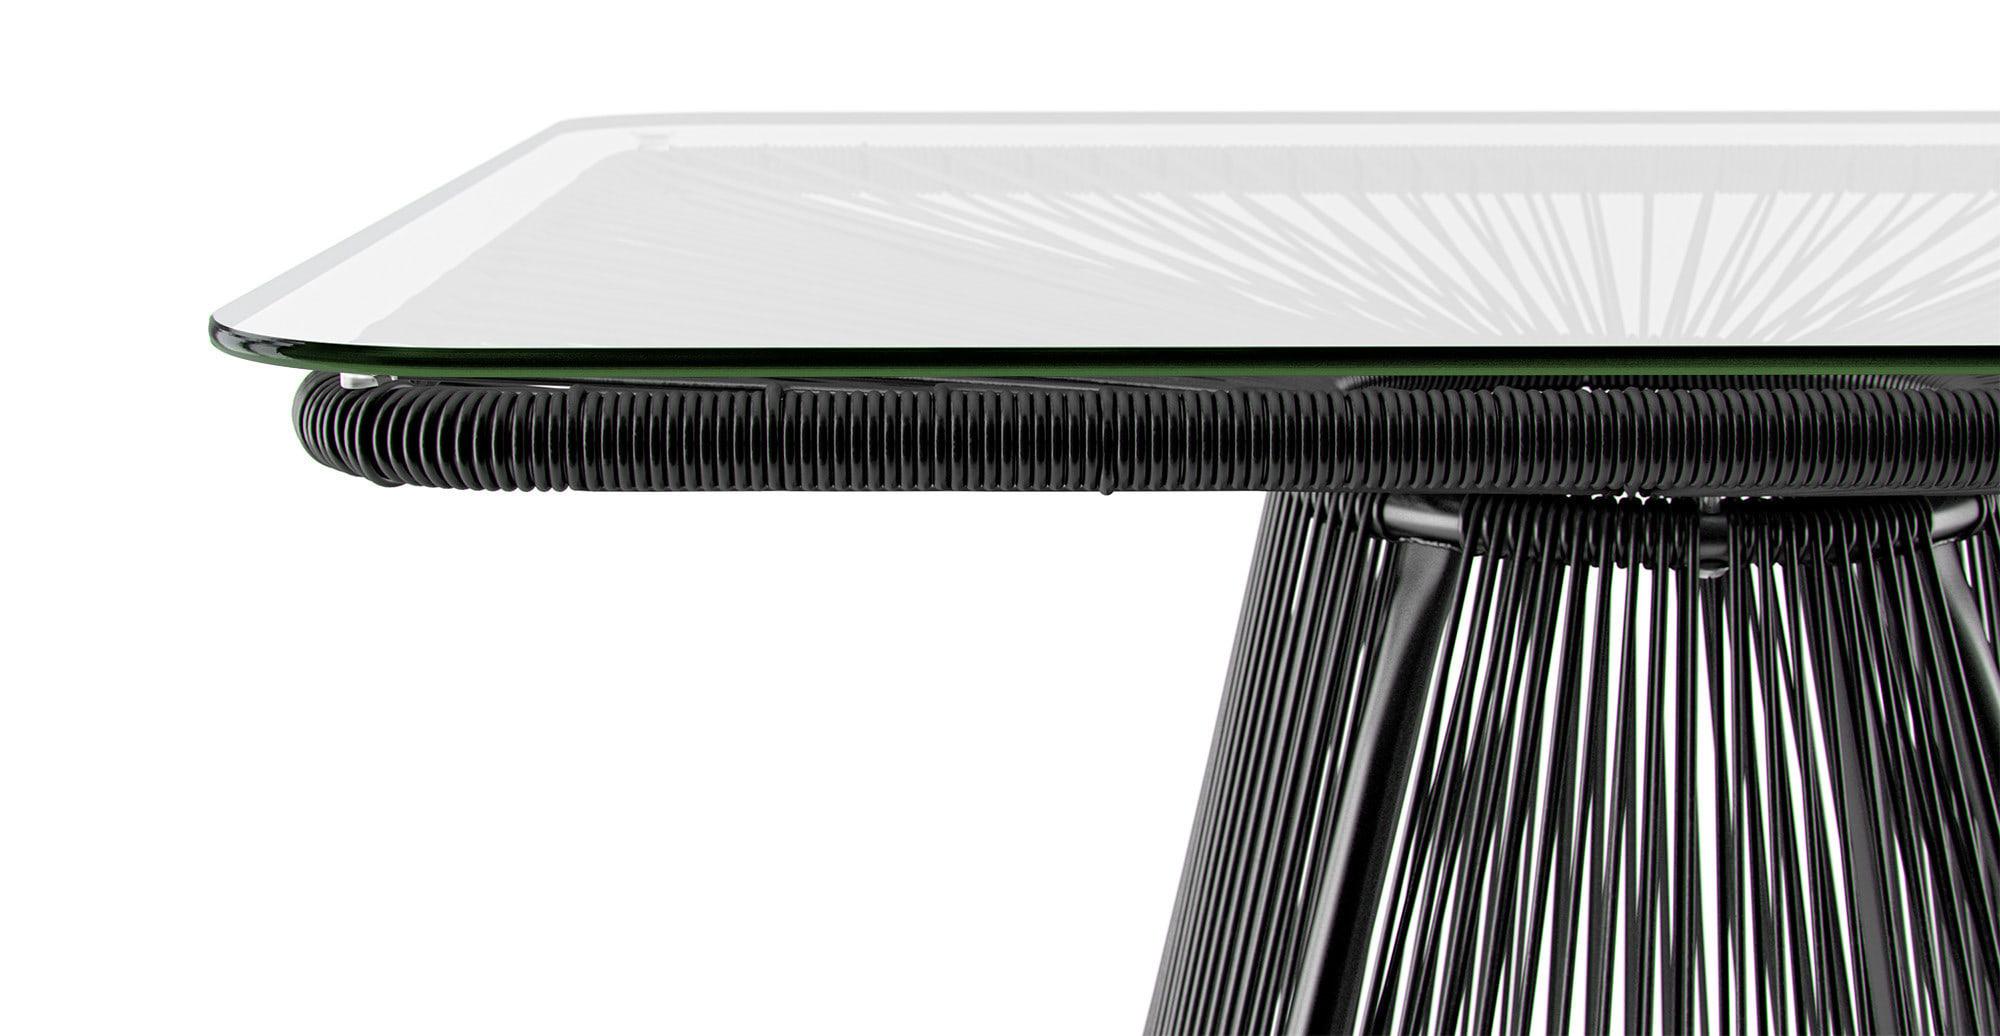 Black outdoor dining table - Lanzarote Outdoor Dining Table